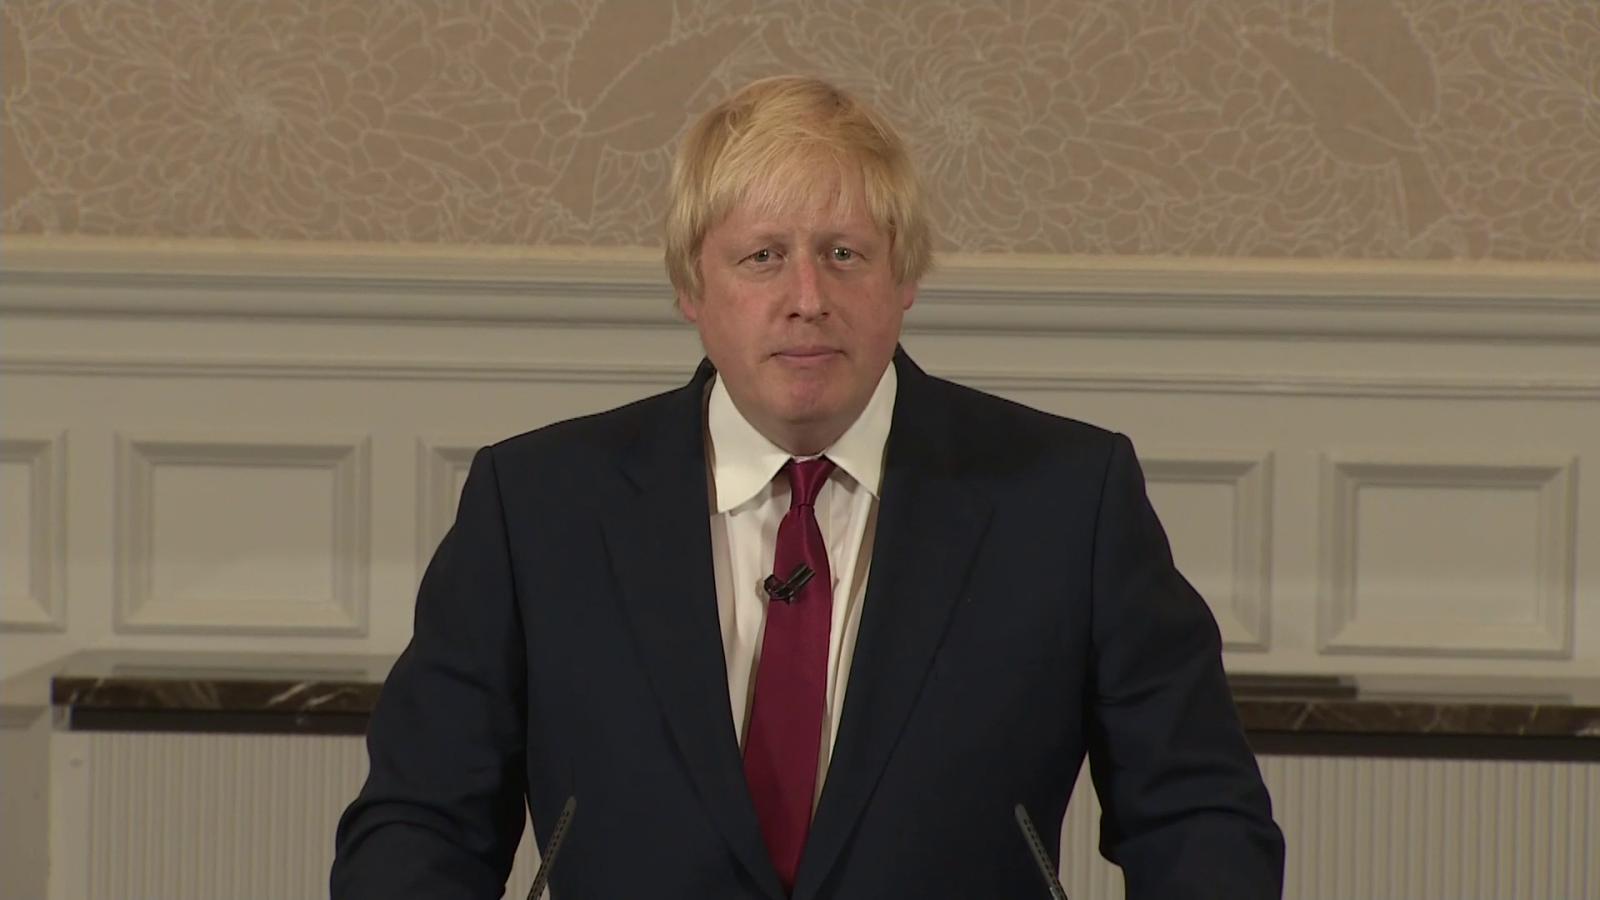 Watch Boris Johnson speech: 'You who have waited ...